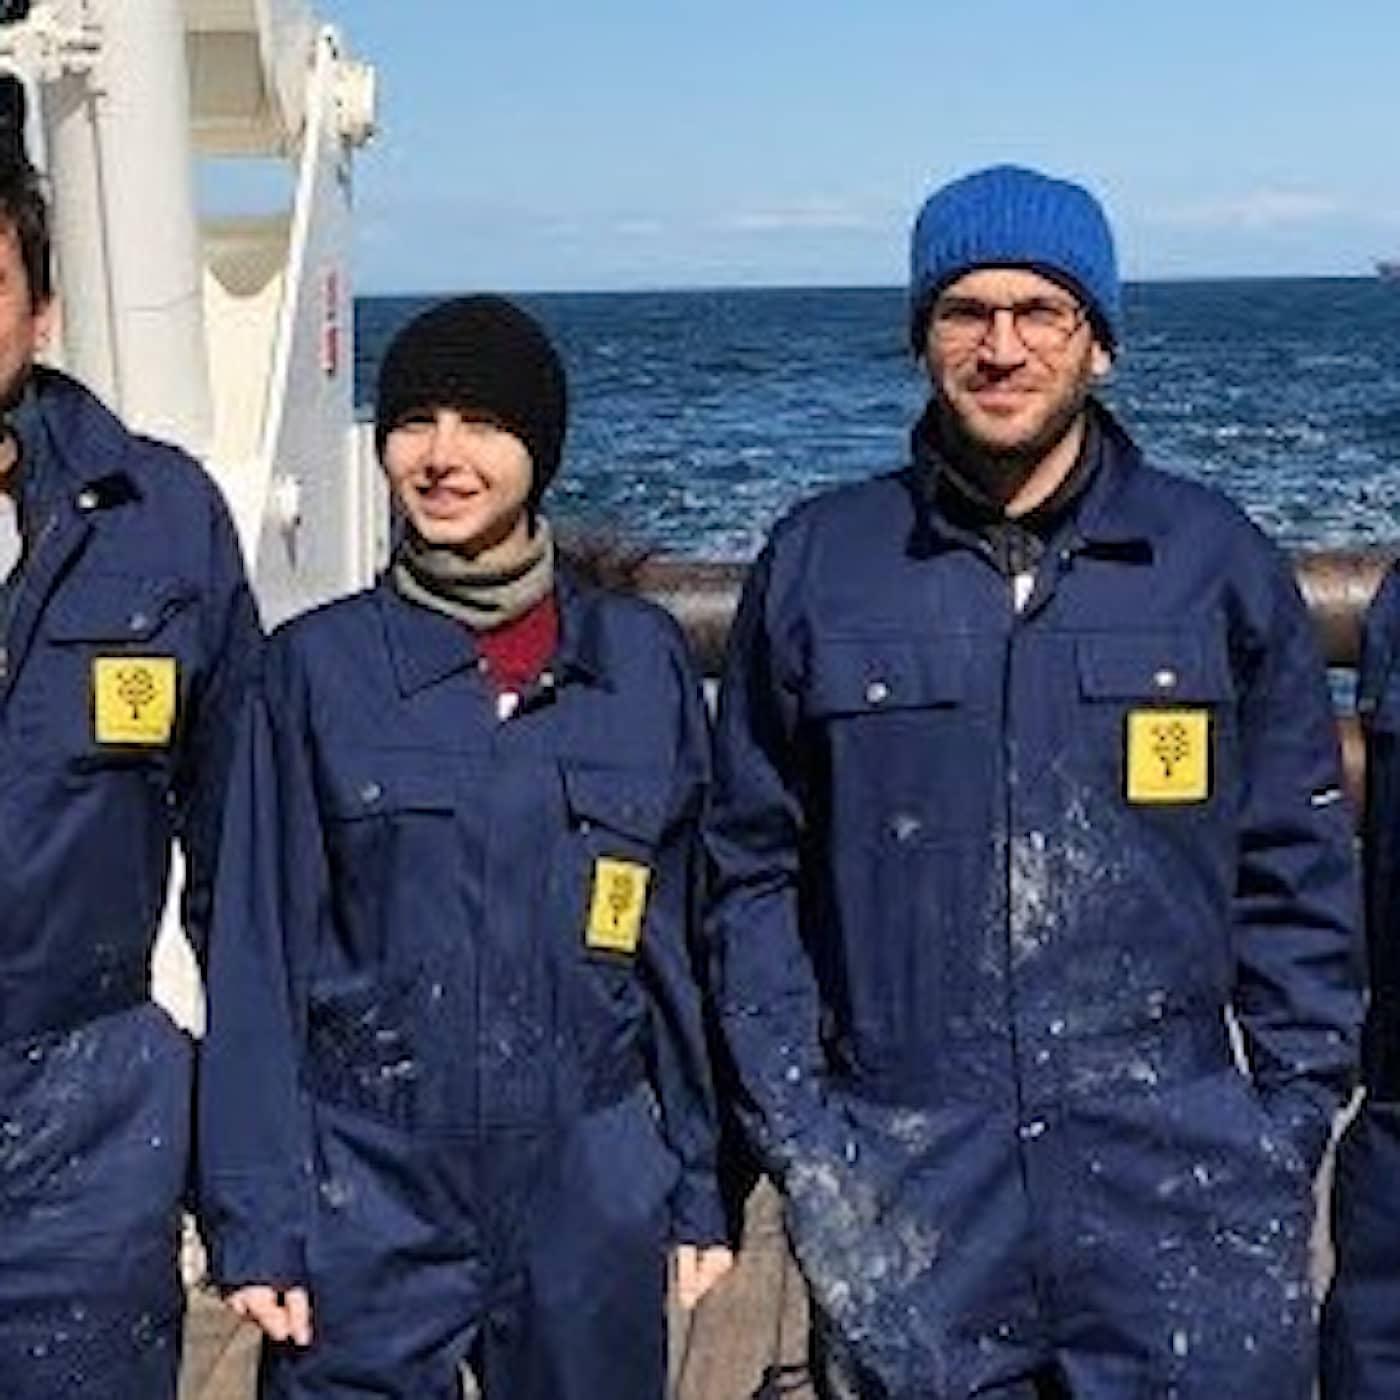 Expeditionen på Sydatlanten fann bubblande metan